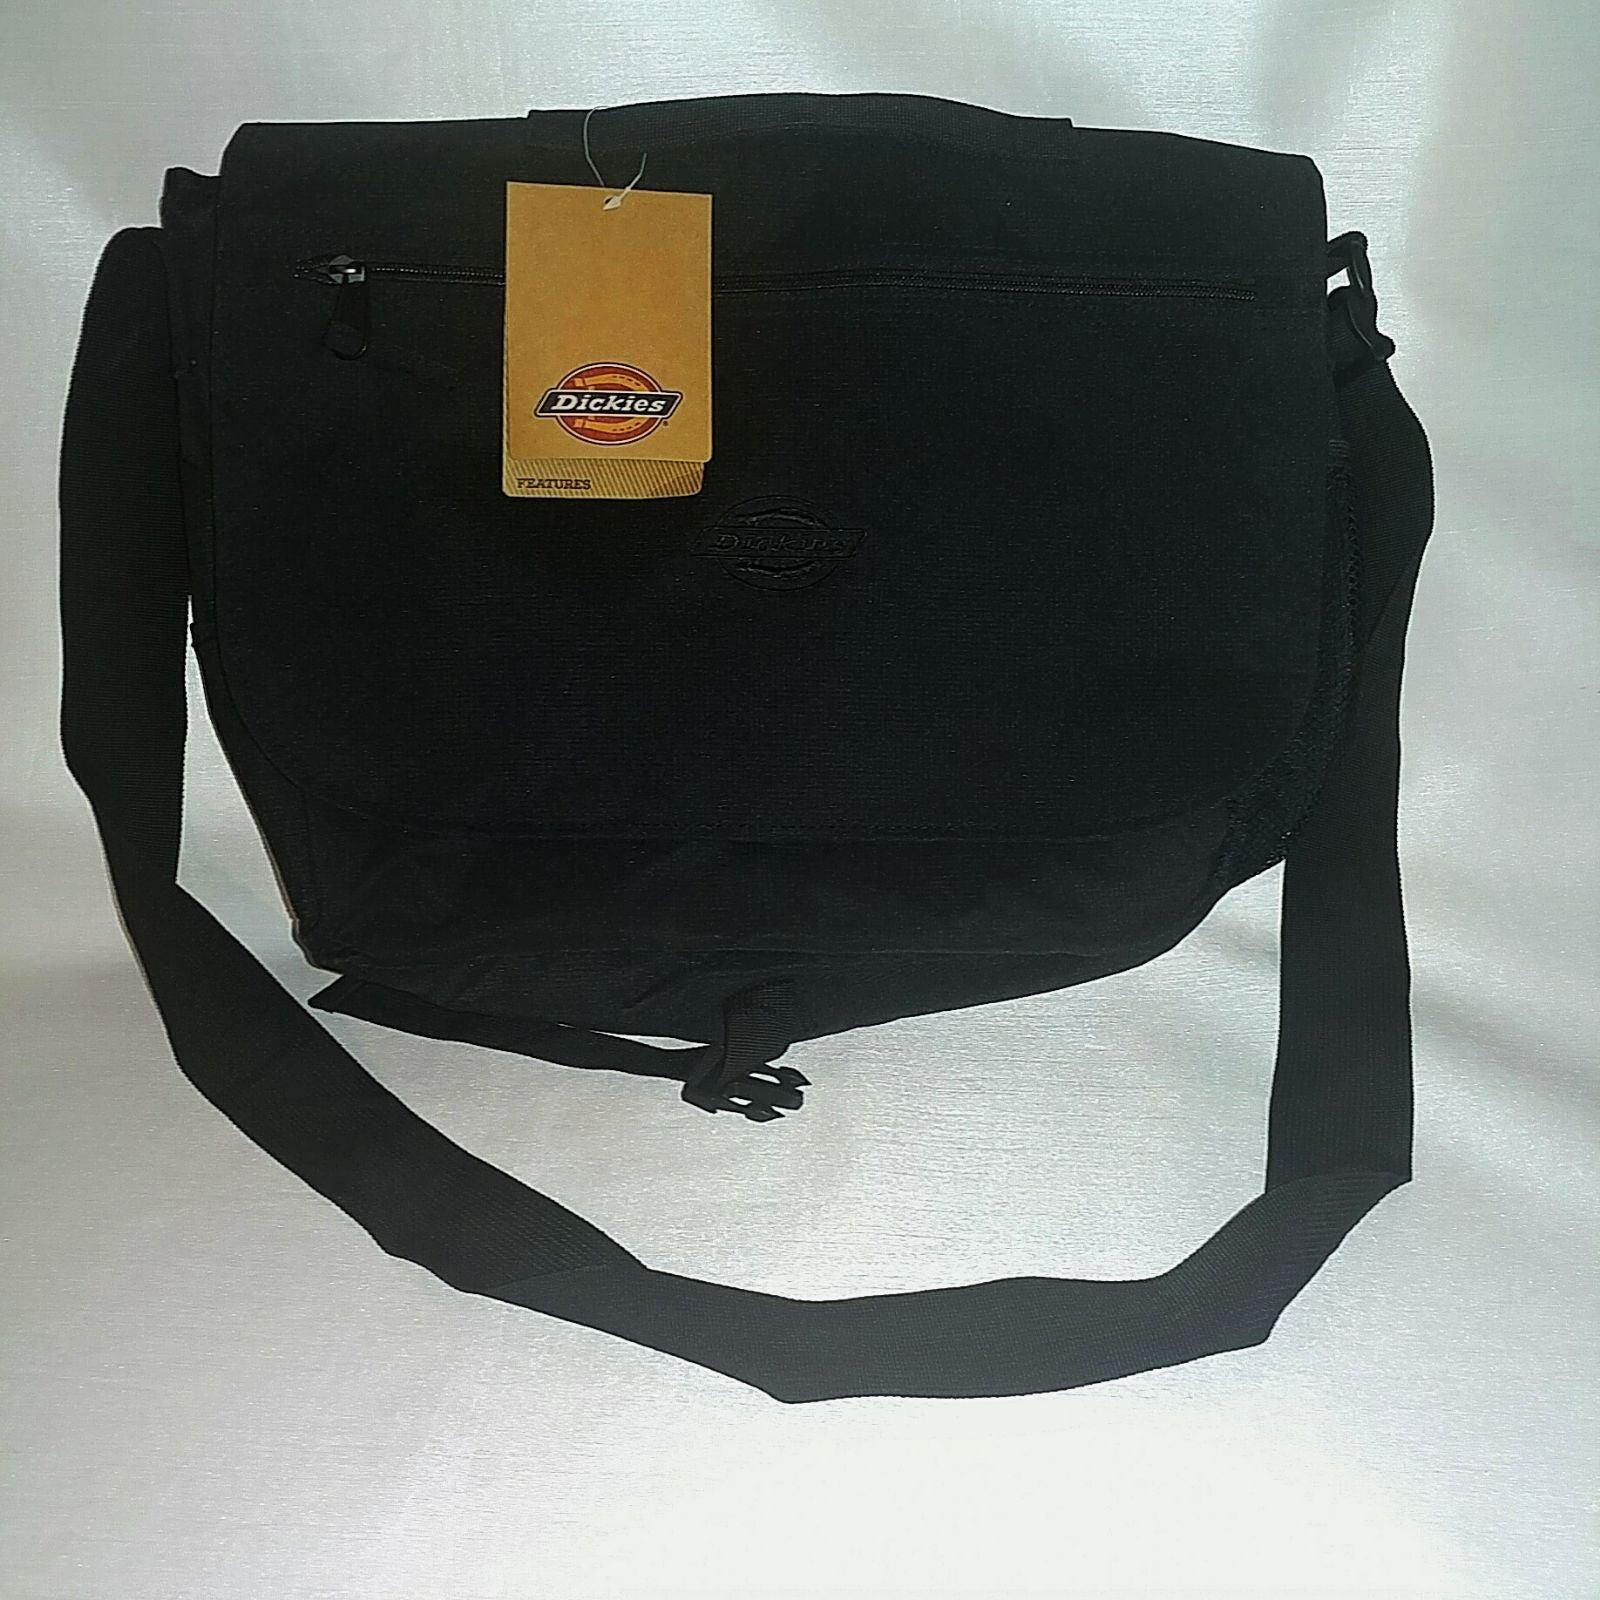 Dickies Messenger Bag, Black, One Size